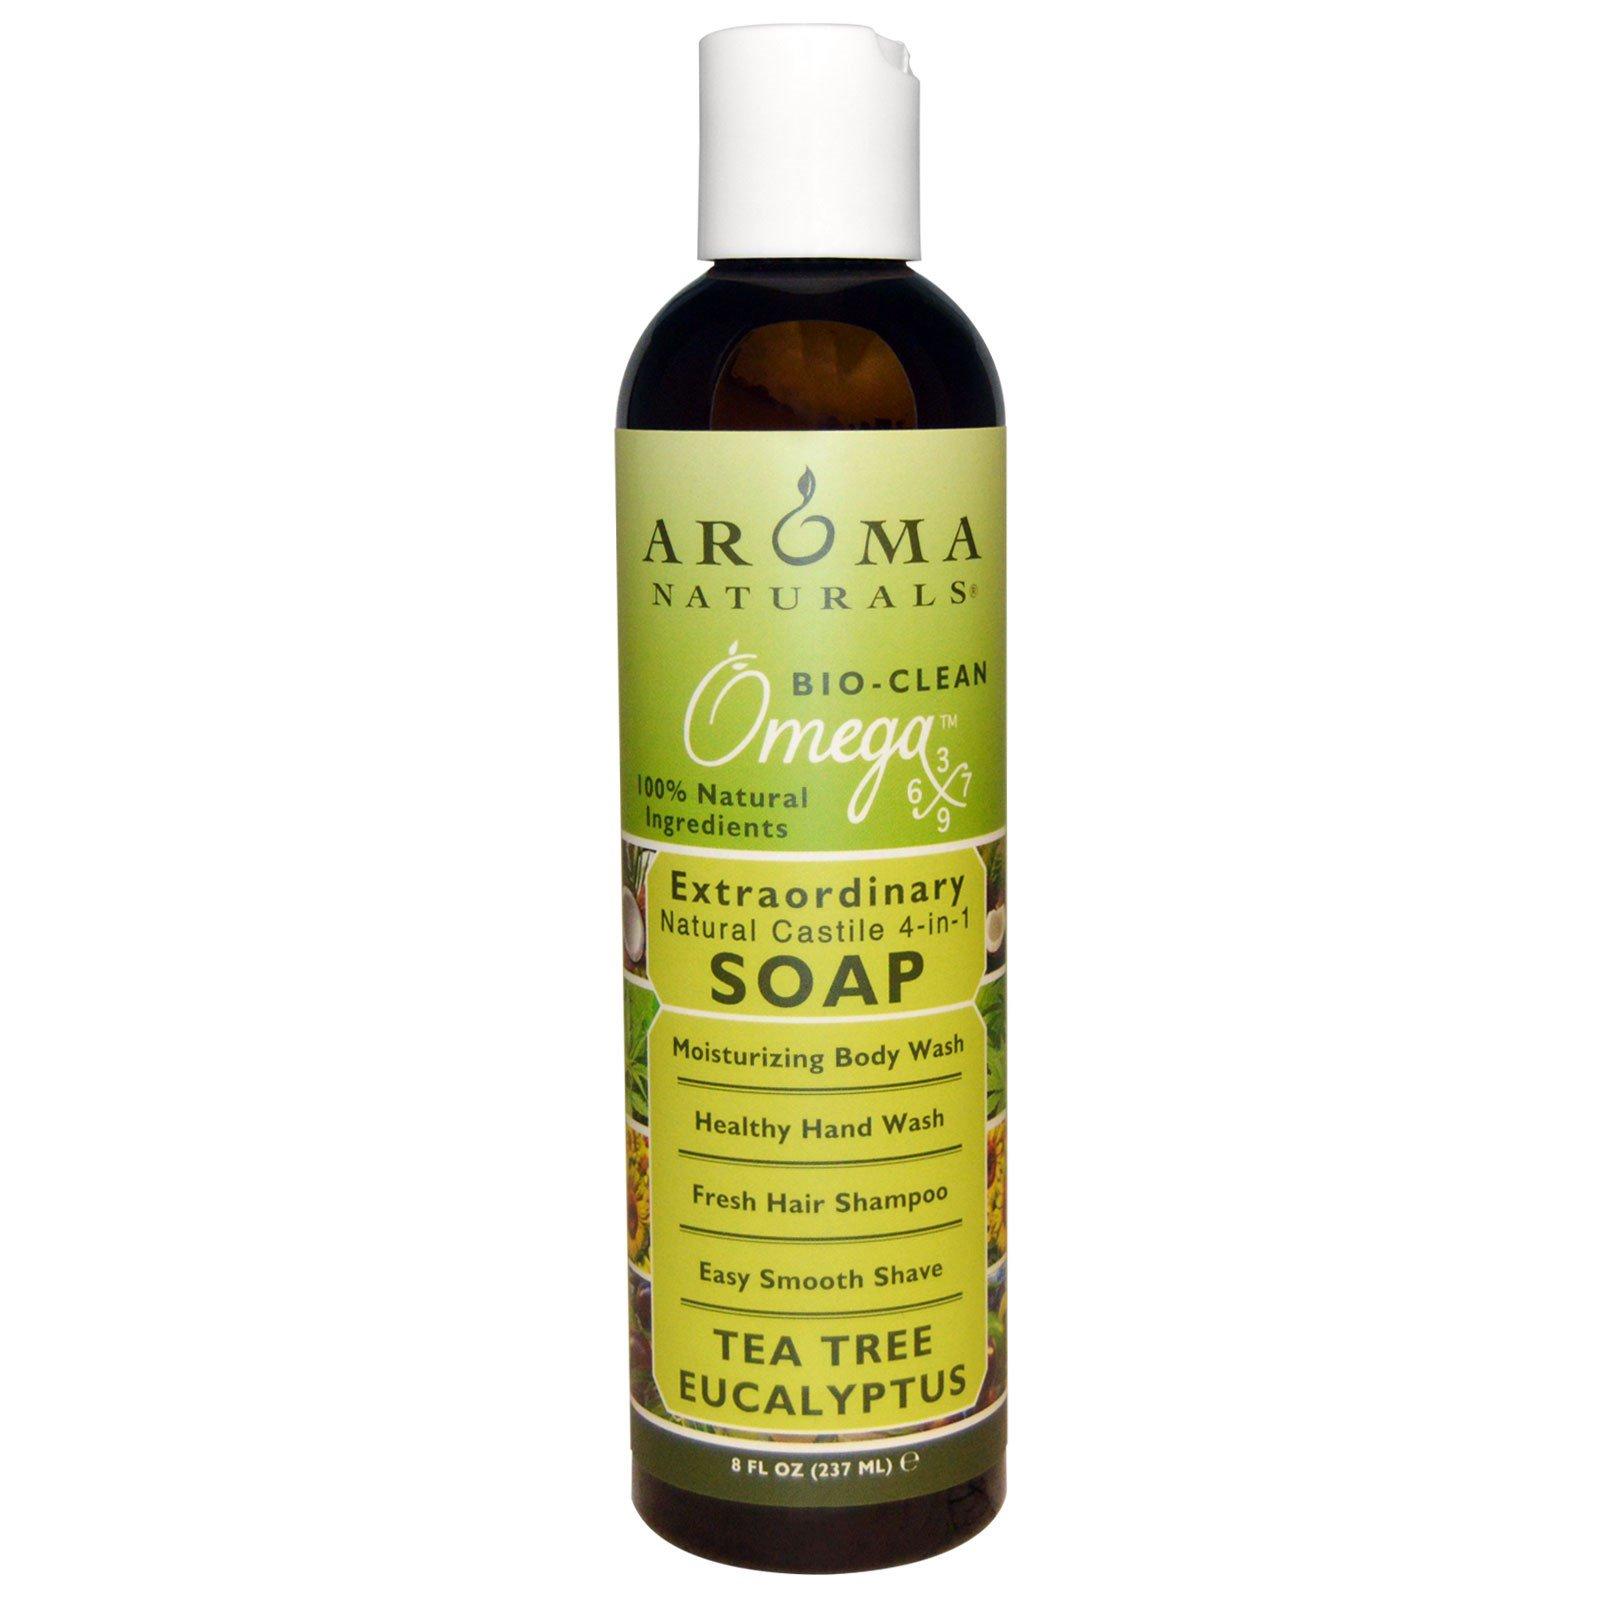 Aroma Naturals, 4-in-1 Soap, Tea Tree Eucalyptus, 8 fl oz (237 ml)